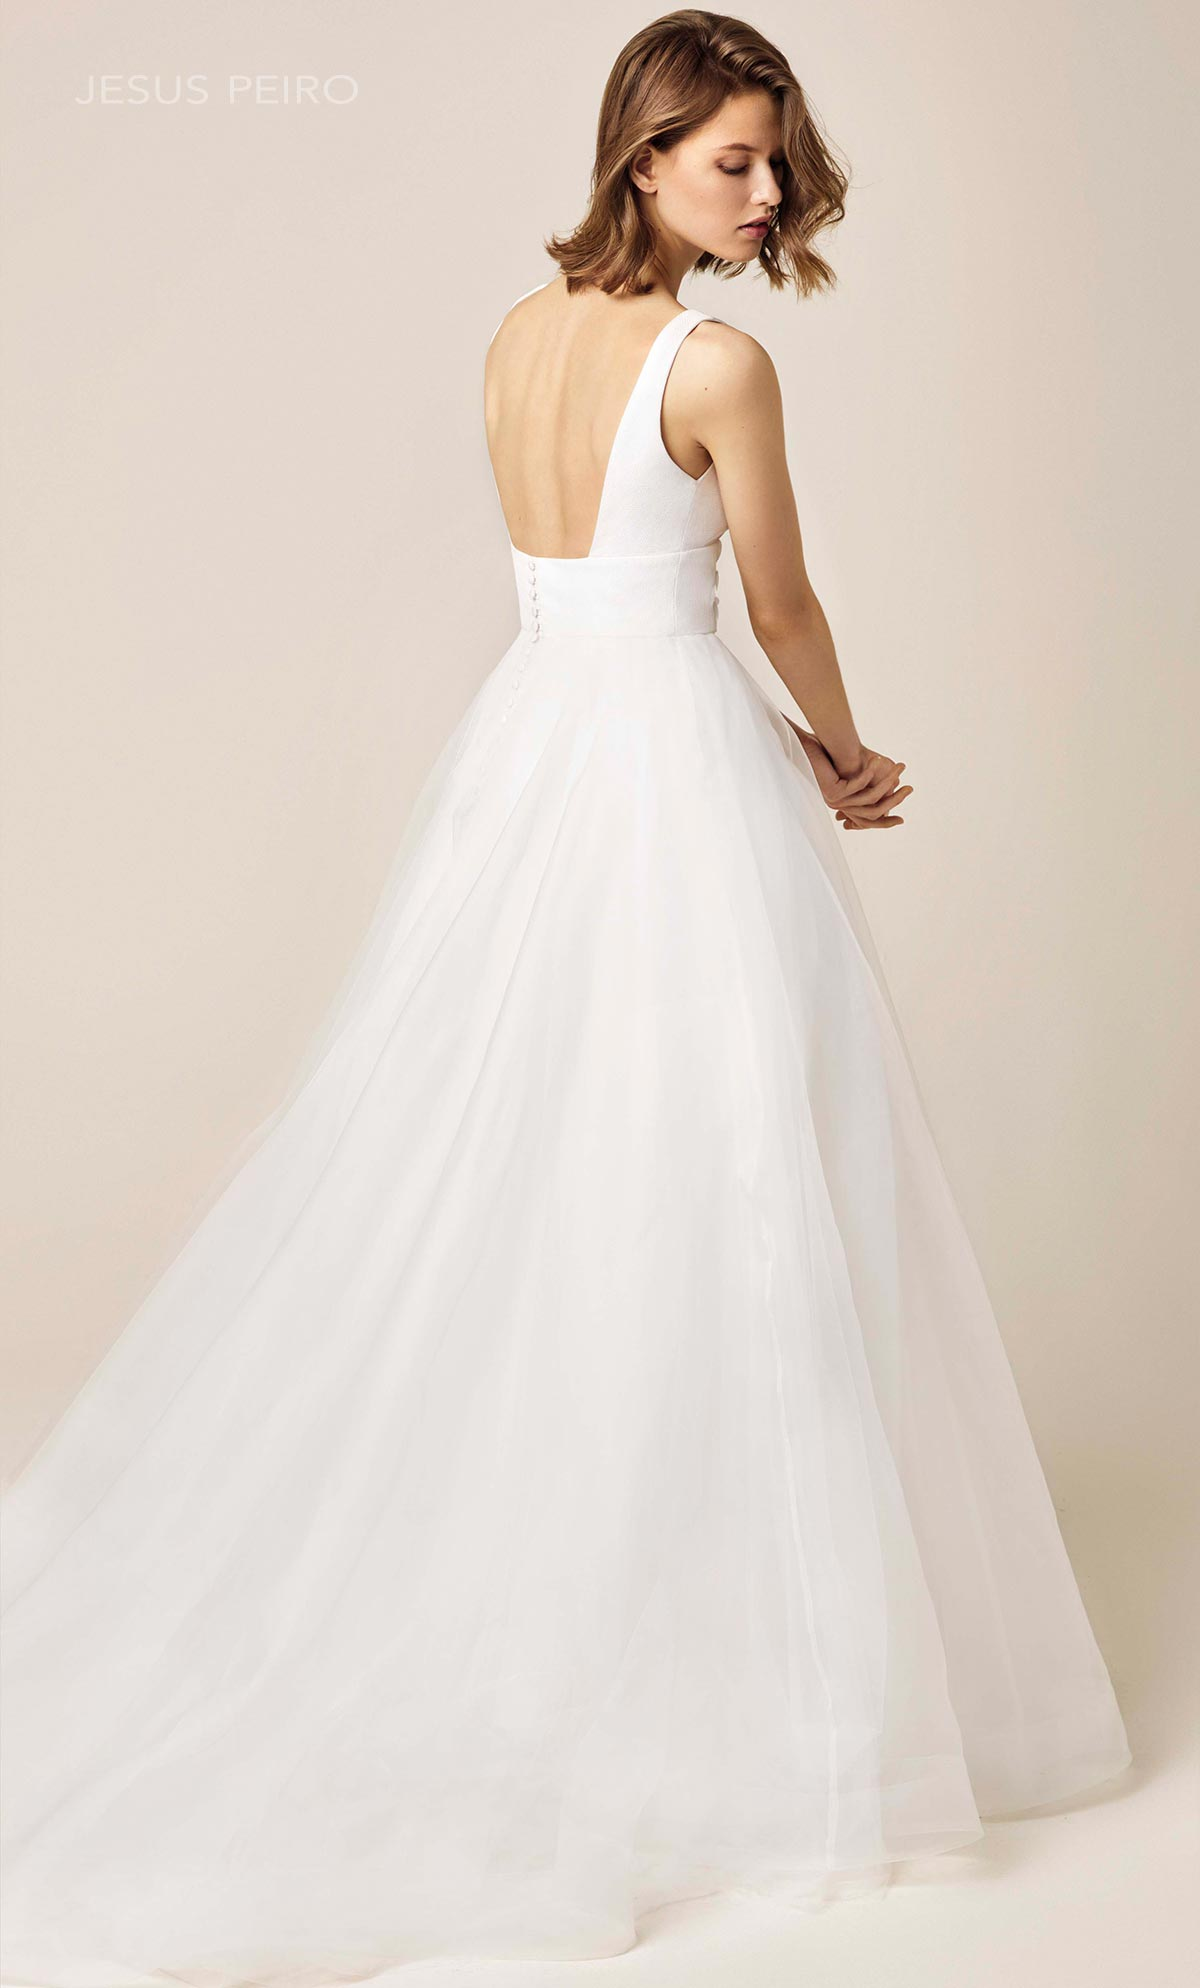 Vestido novia Jesús Peiró Ref.926